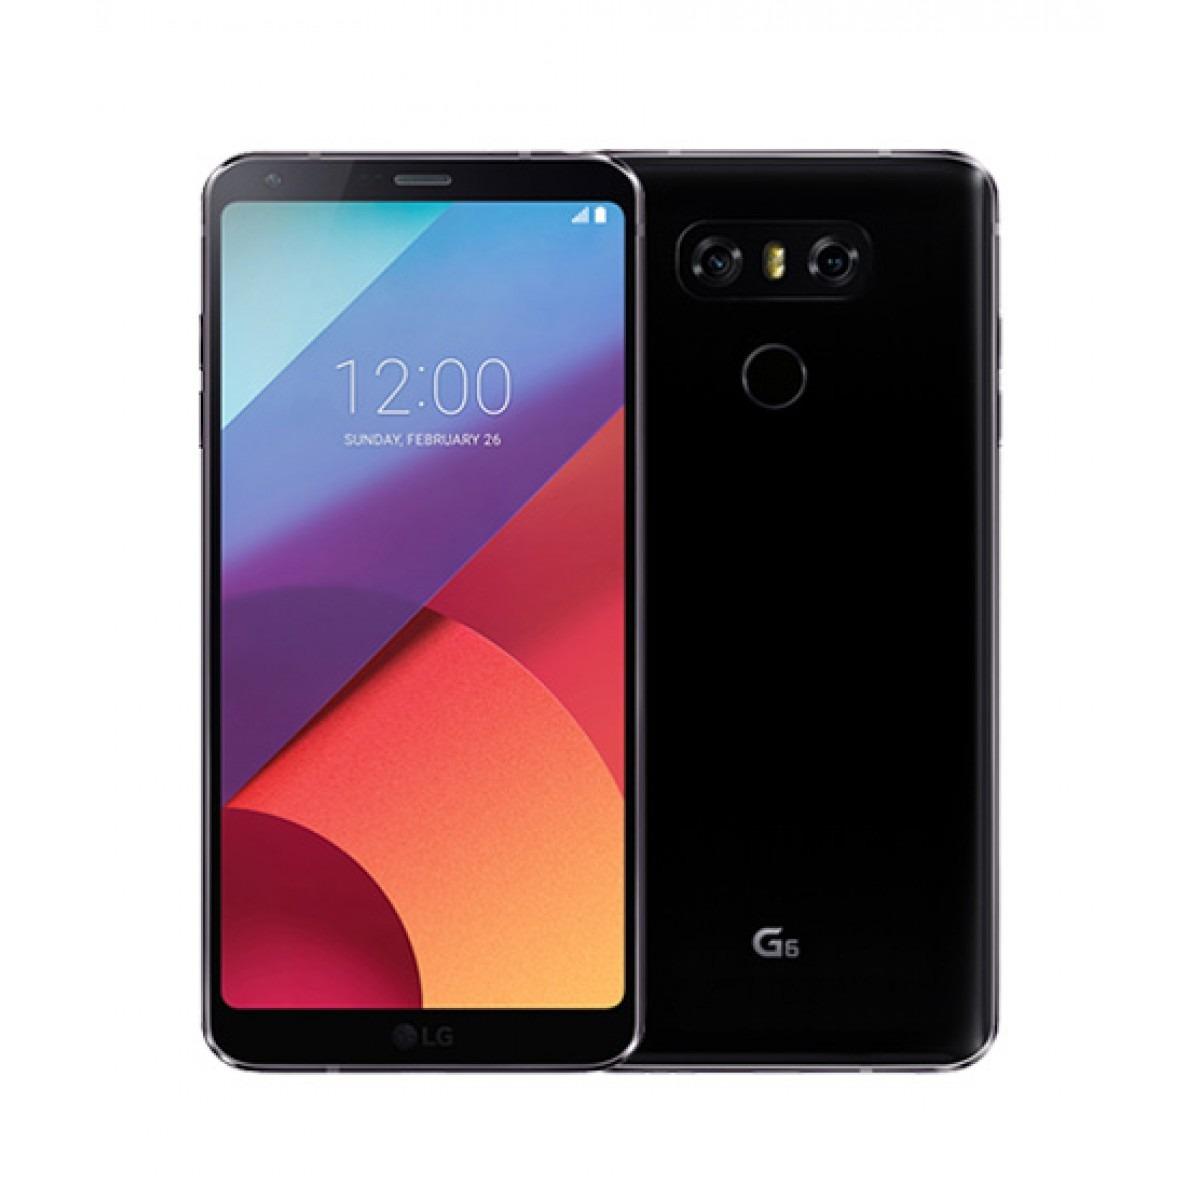 NOWY Telefon LG G6 H870 Astro Black + GRATISY